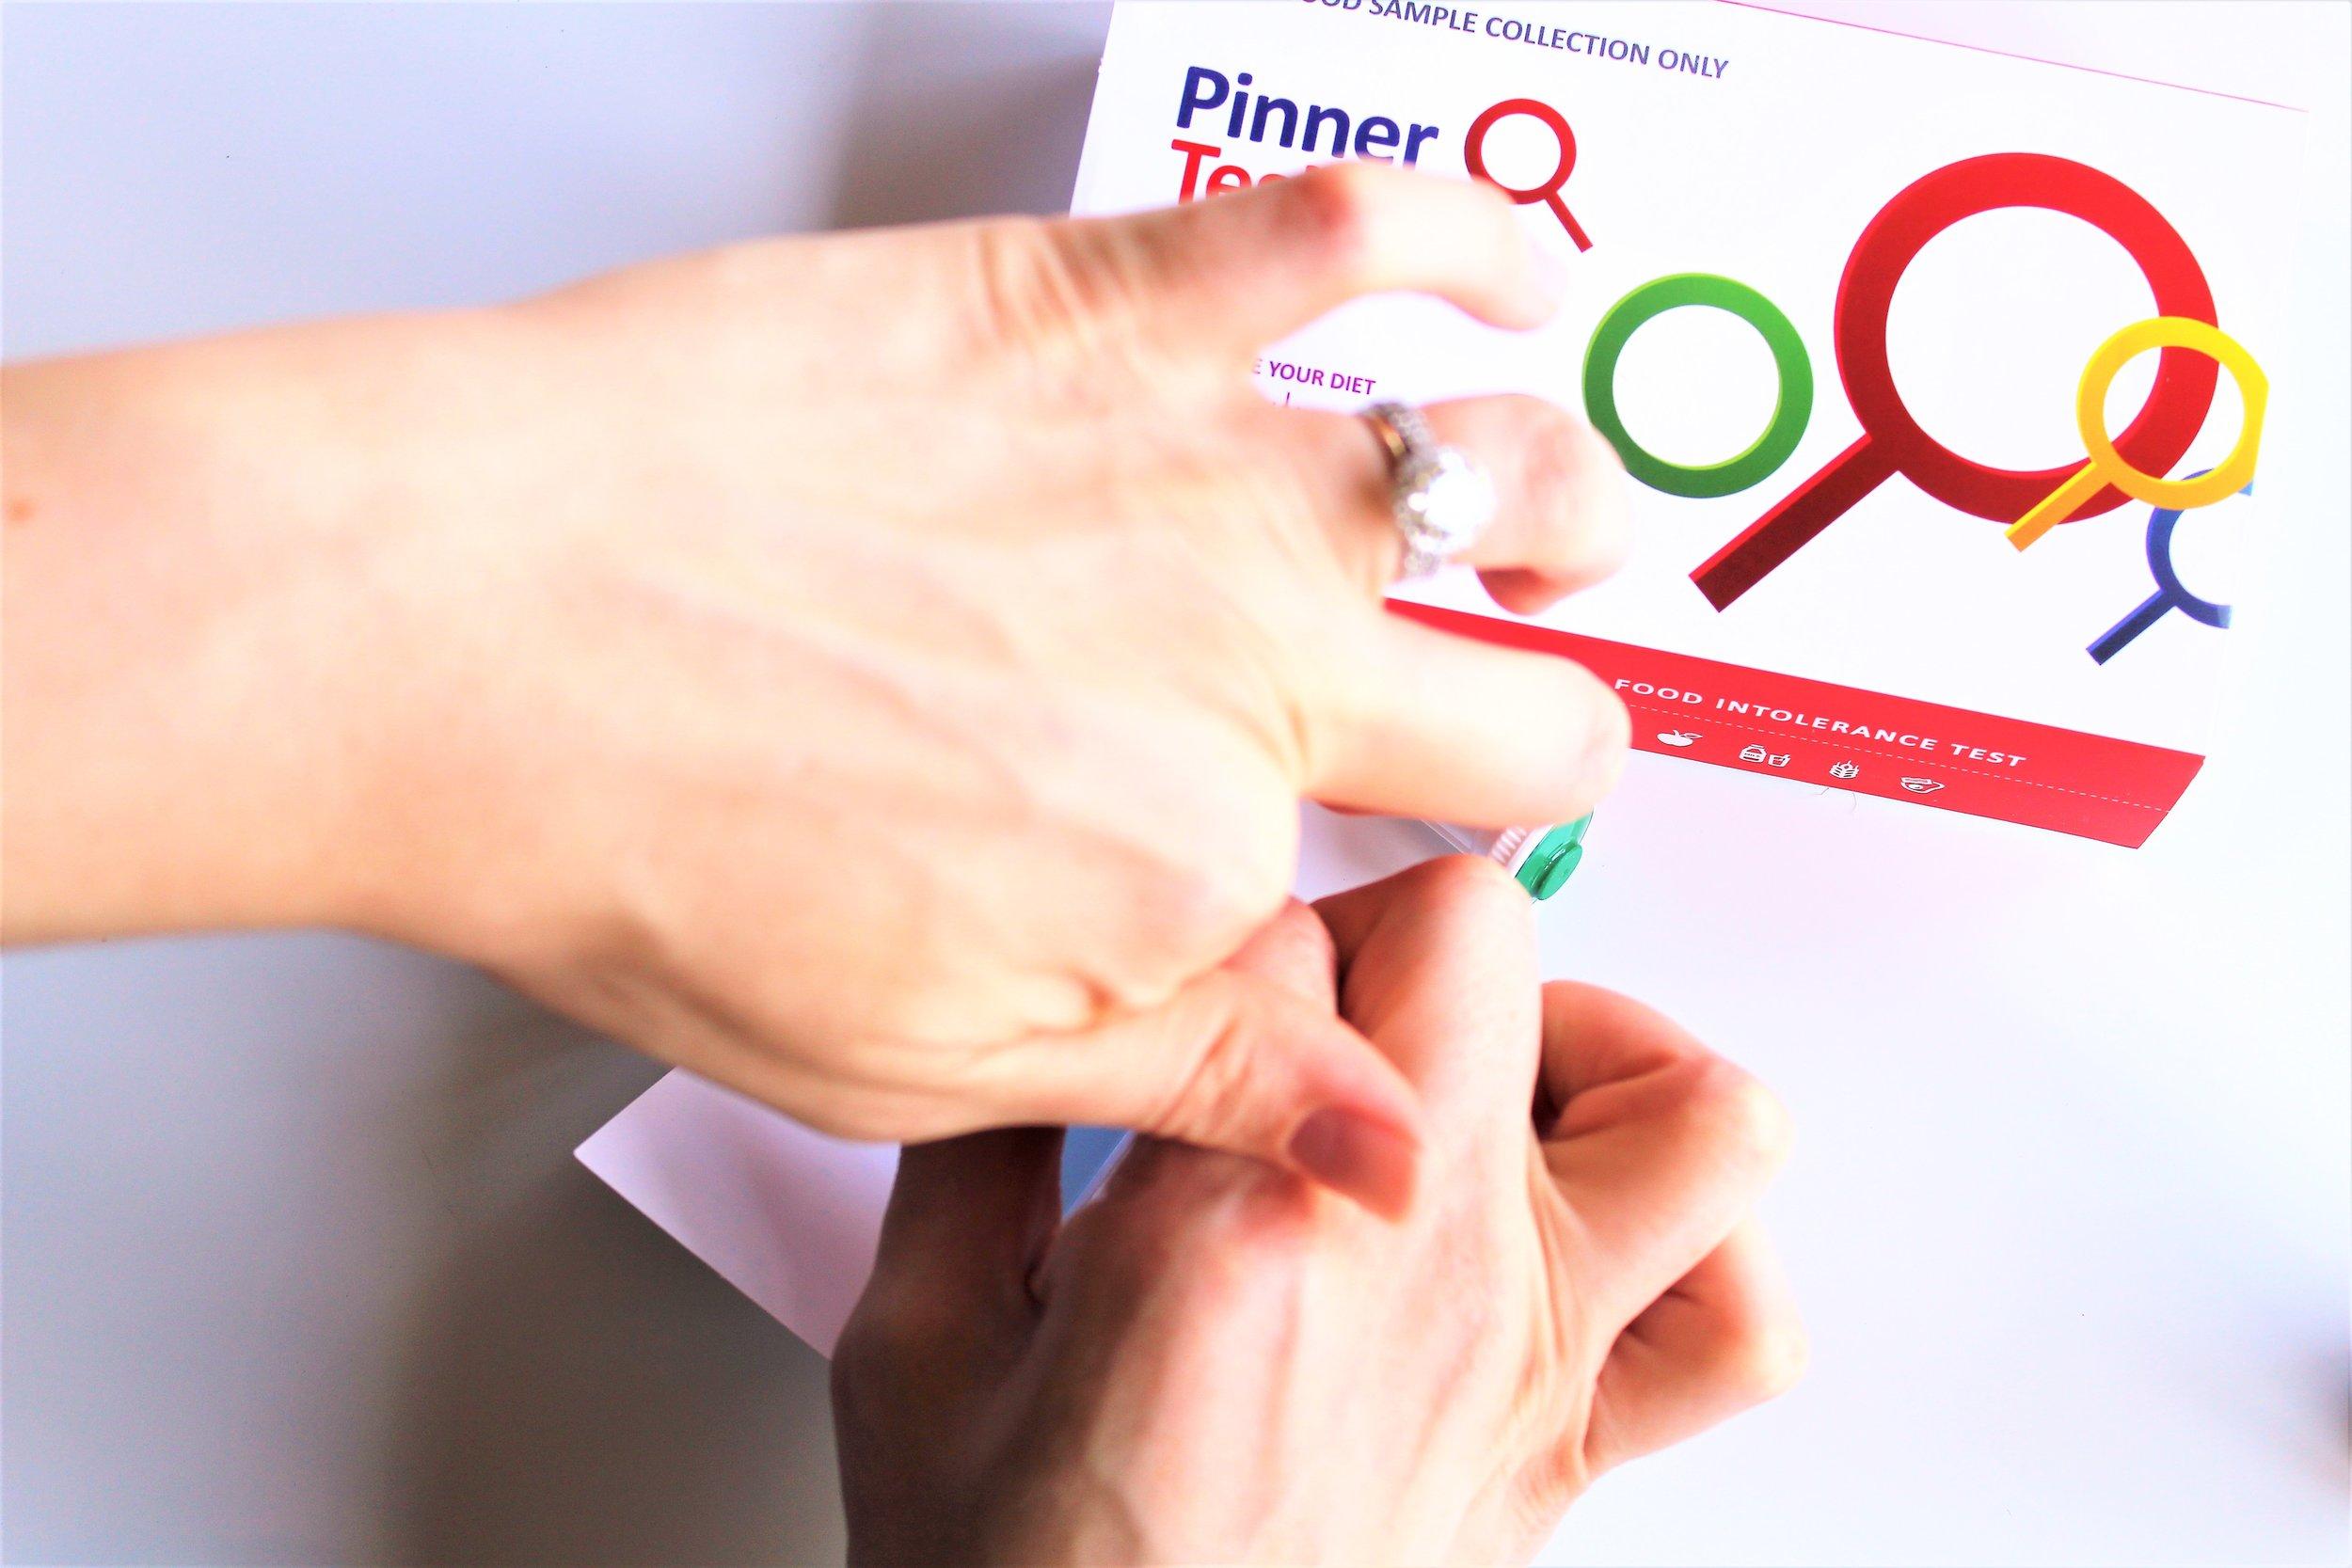 pinner test process pricking finger